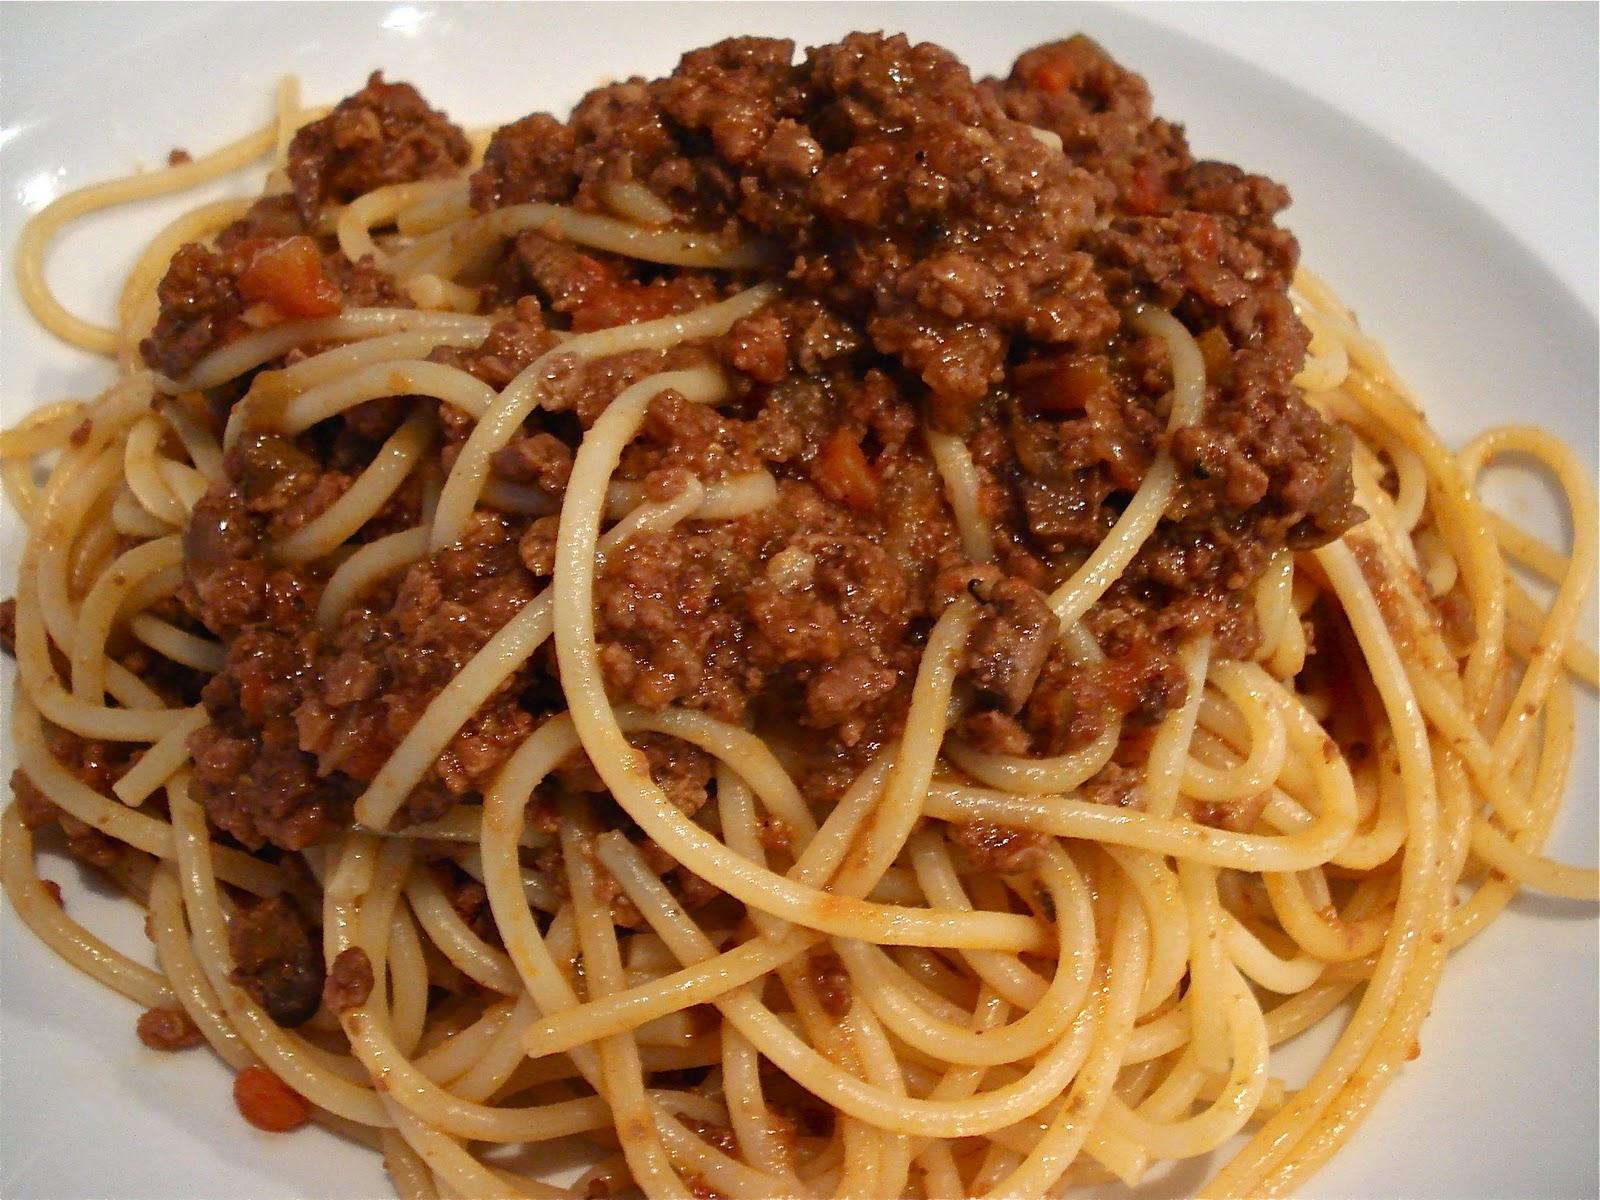 http://4.bp.blogspot.com/-c0q-b_gwVGU/TWYWpYZe1TI/AAAAAAAAAMw/dlp7aZkrsbs/s1600/Spaghetti+al+ragu.JPG